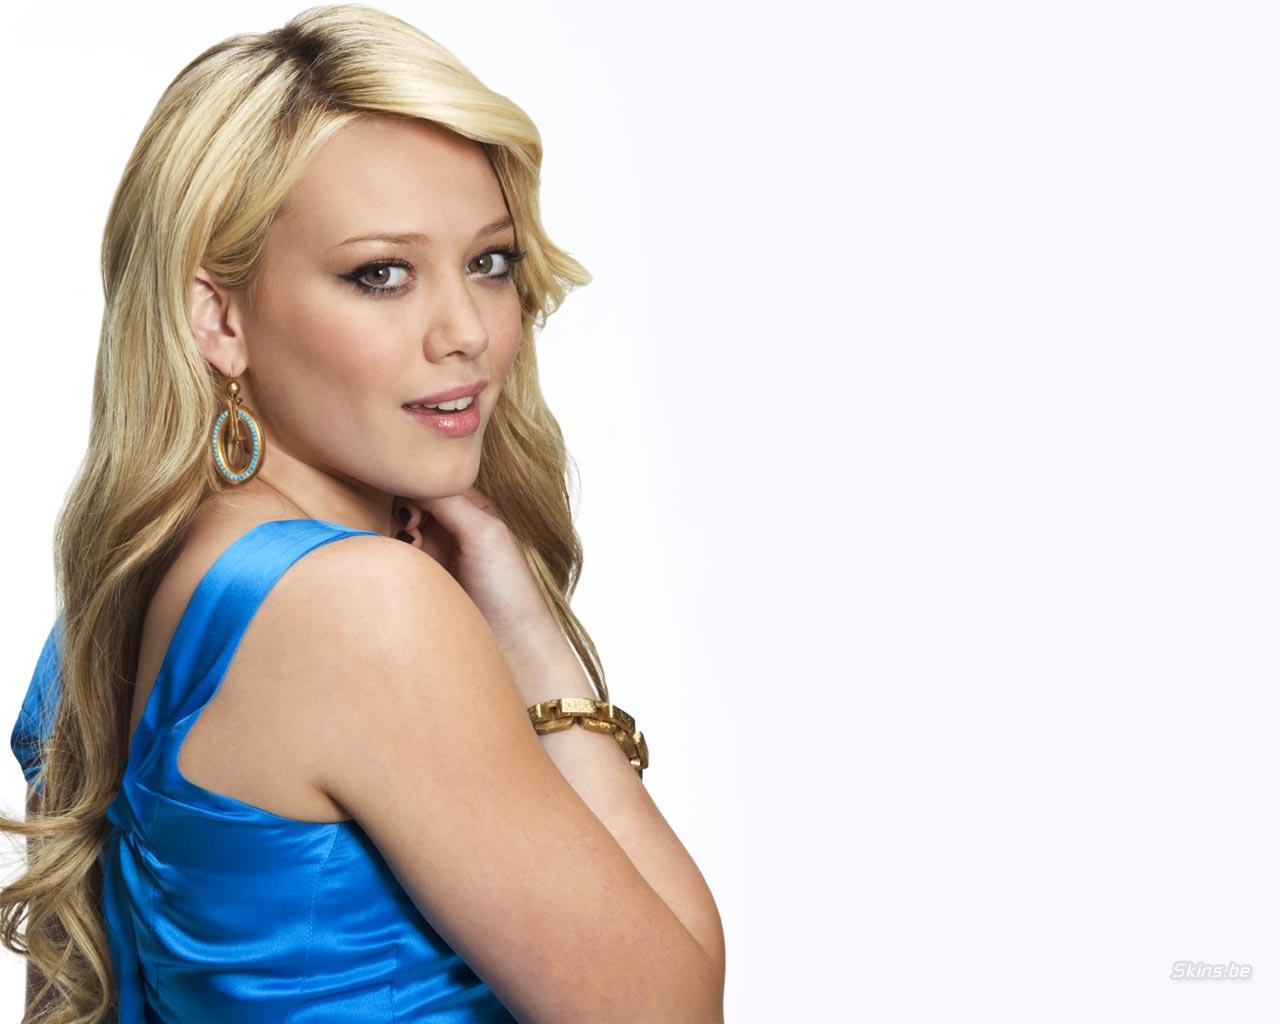 Hilary - Hilary Duff W... Hilary Duff Facebook